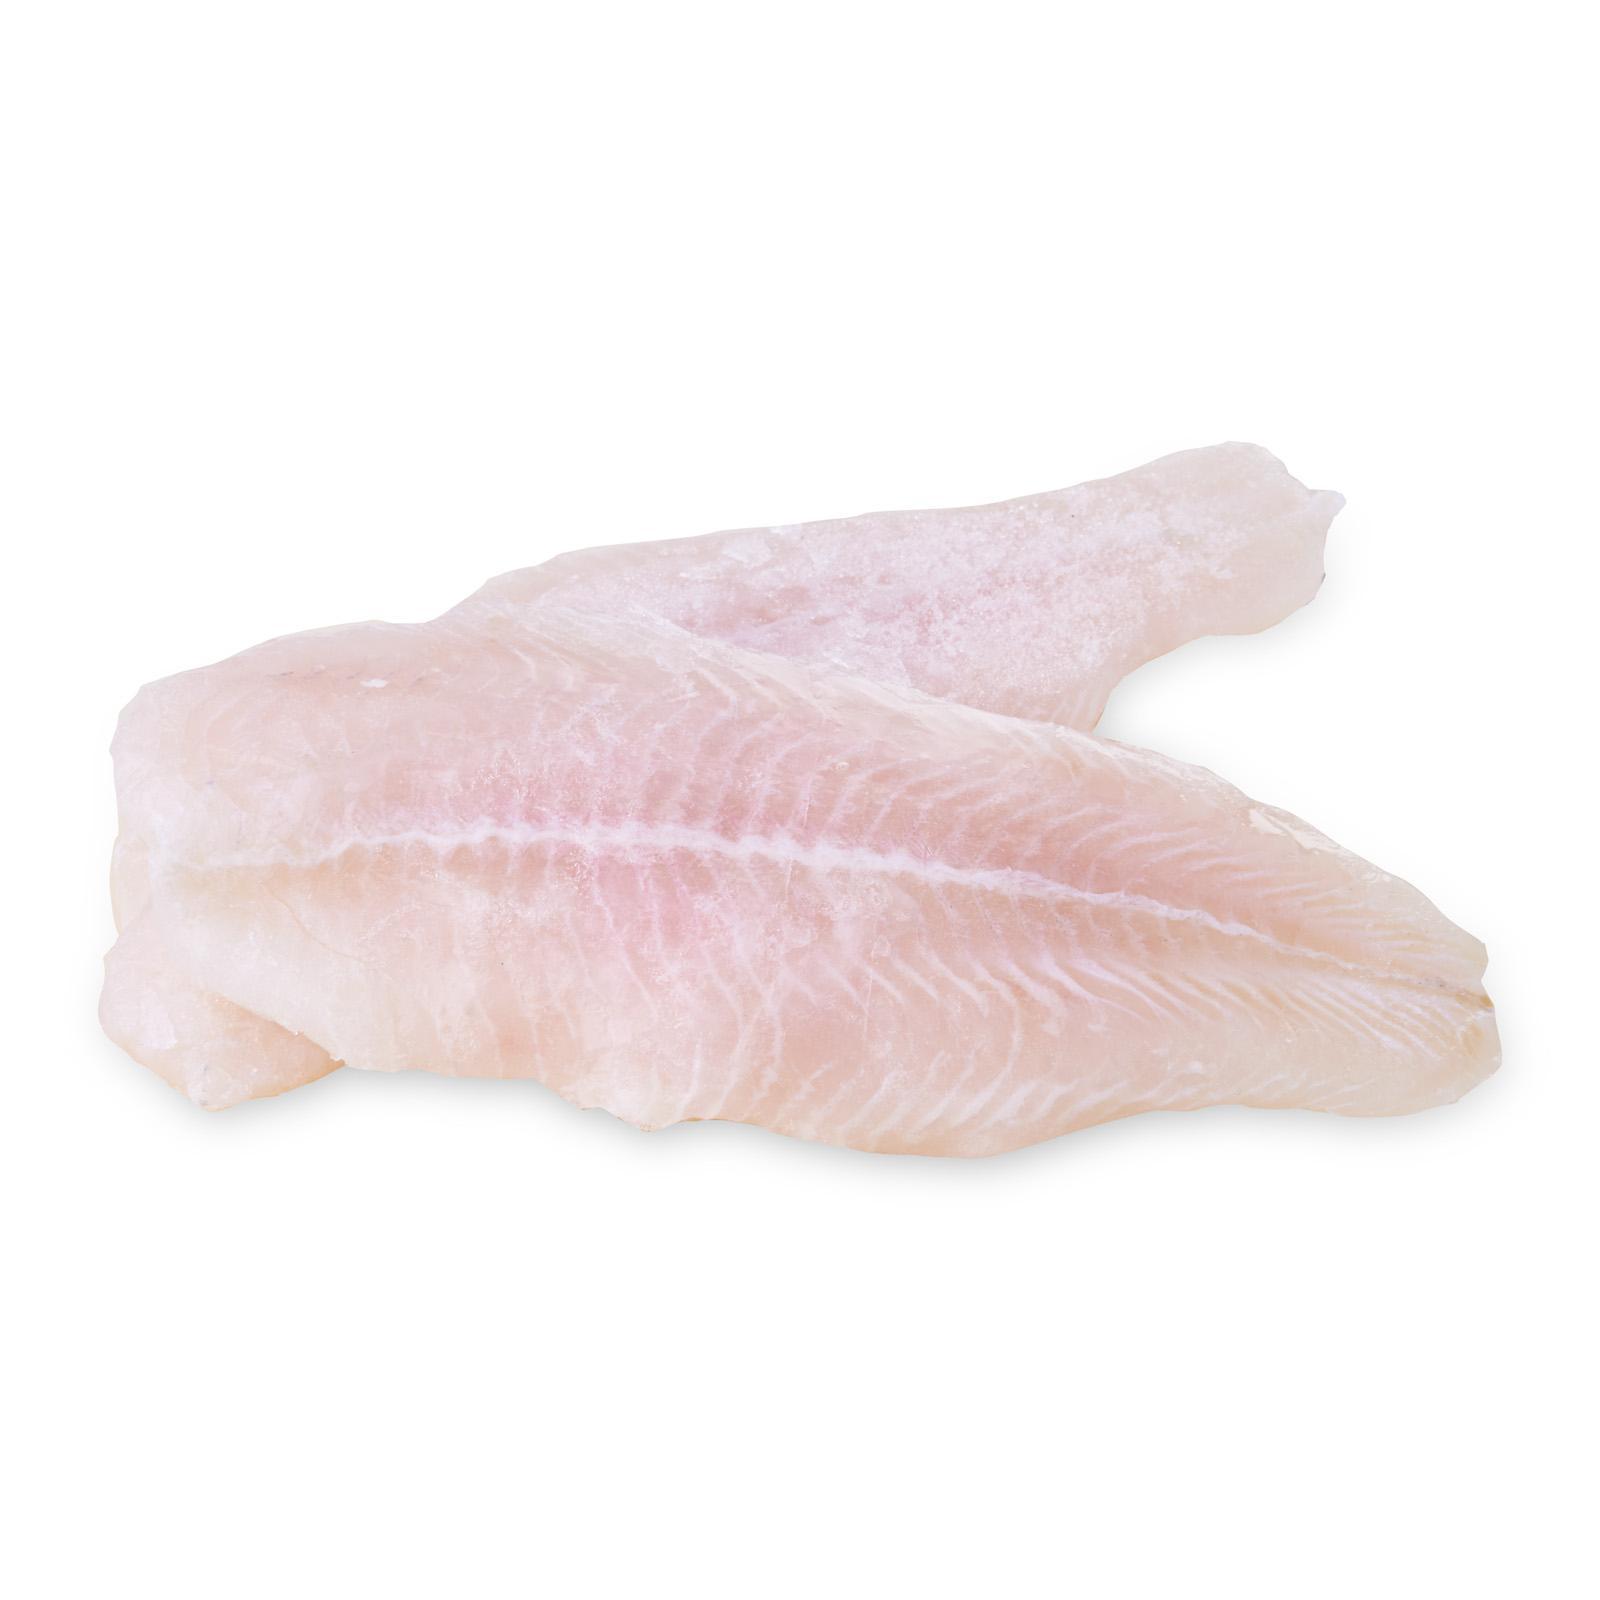 Seafood Shifu Dory Sutchi Fillet - Frozen